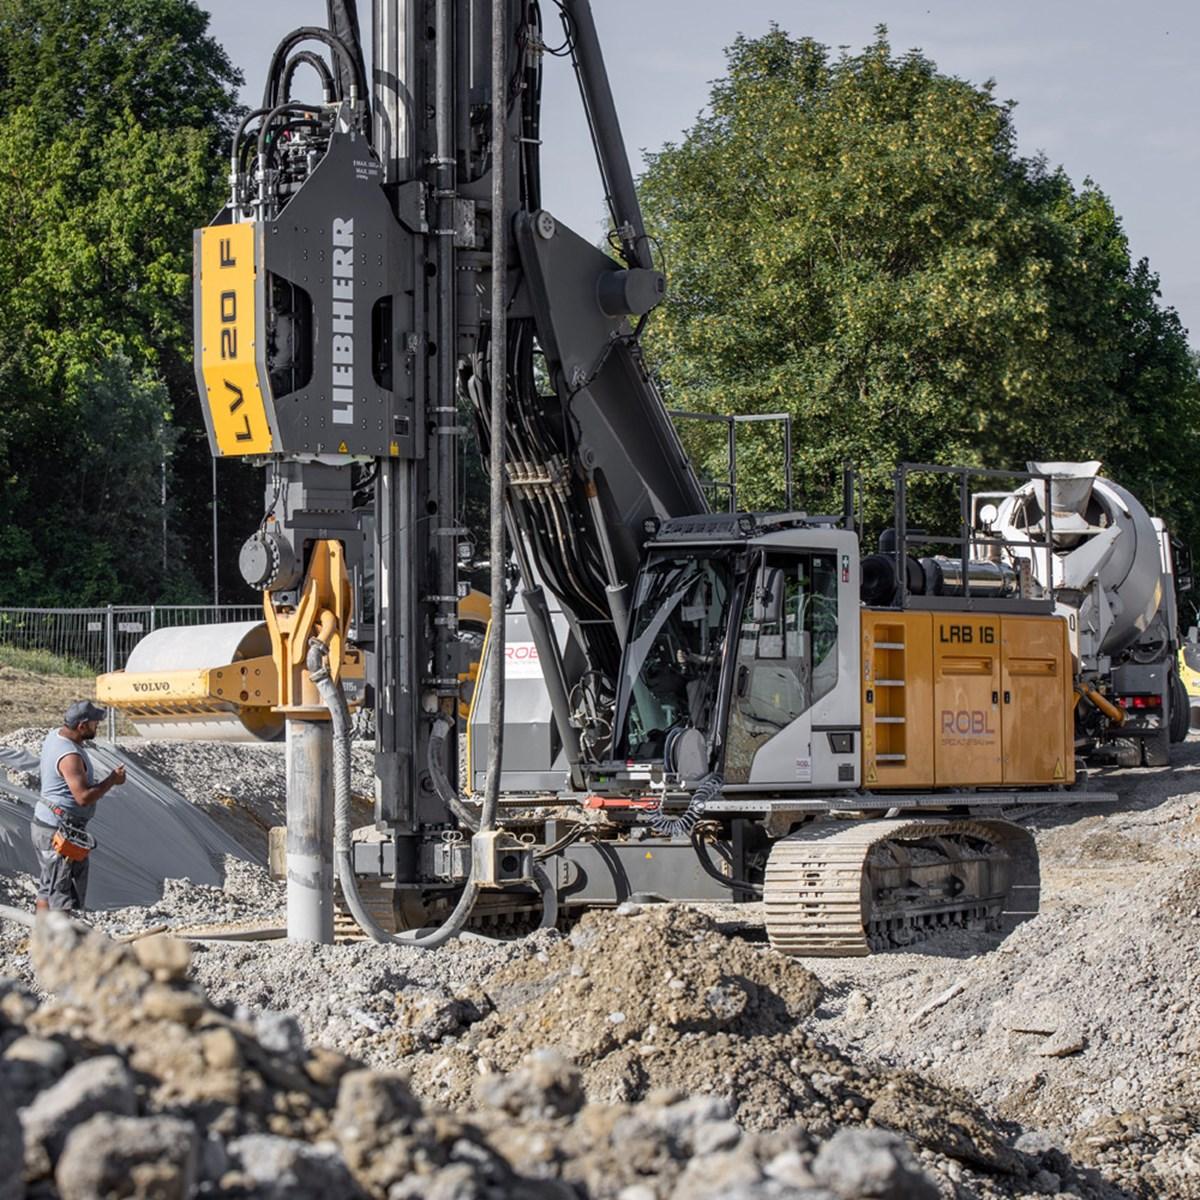 liebherr-piling-rig-lrb-16-deep-foundation-vibrator-sheet-piles-spundwande-r-3.jpg